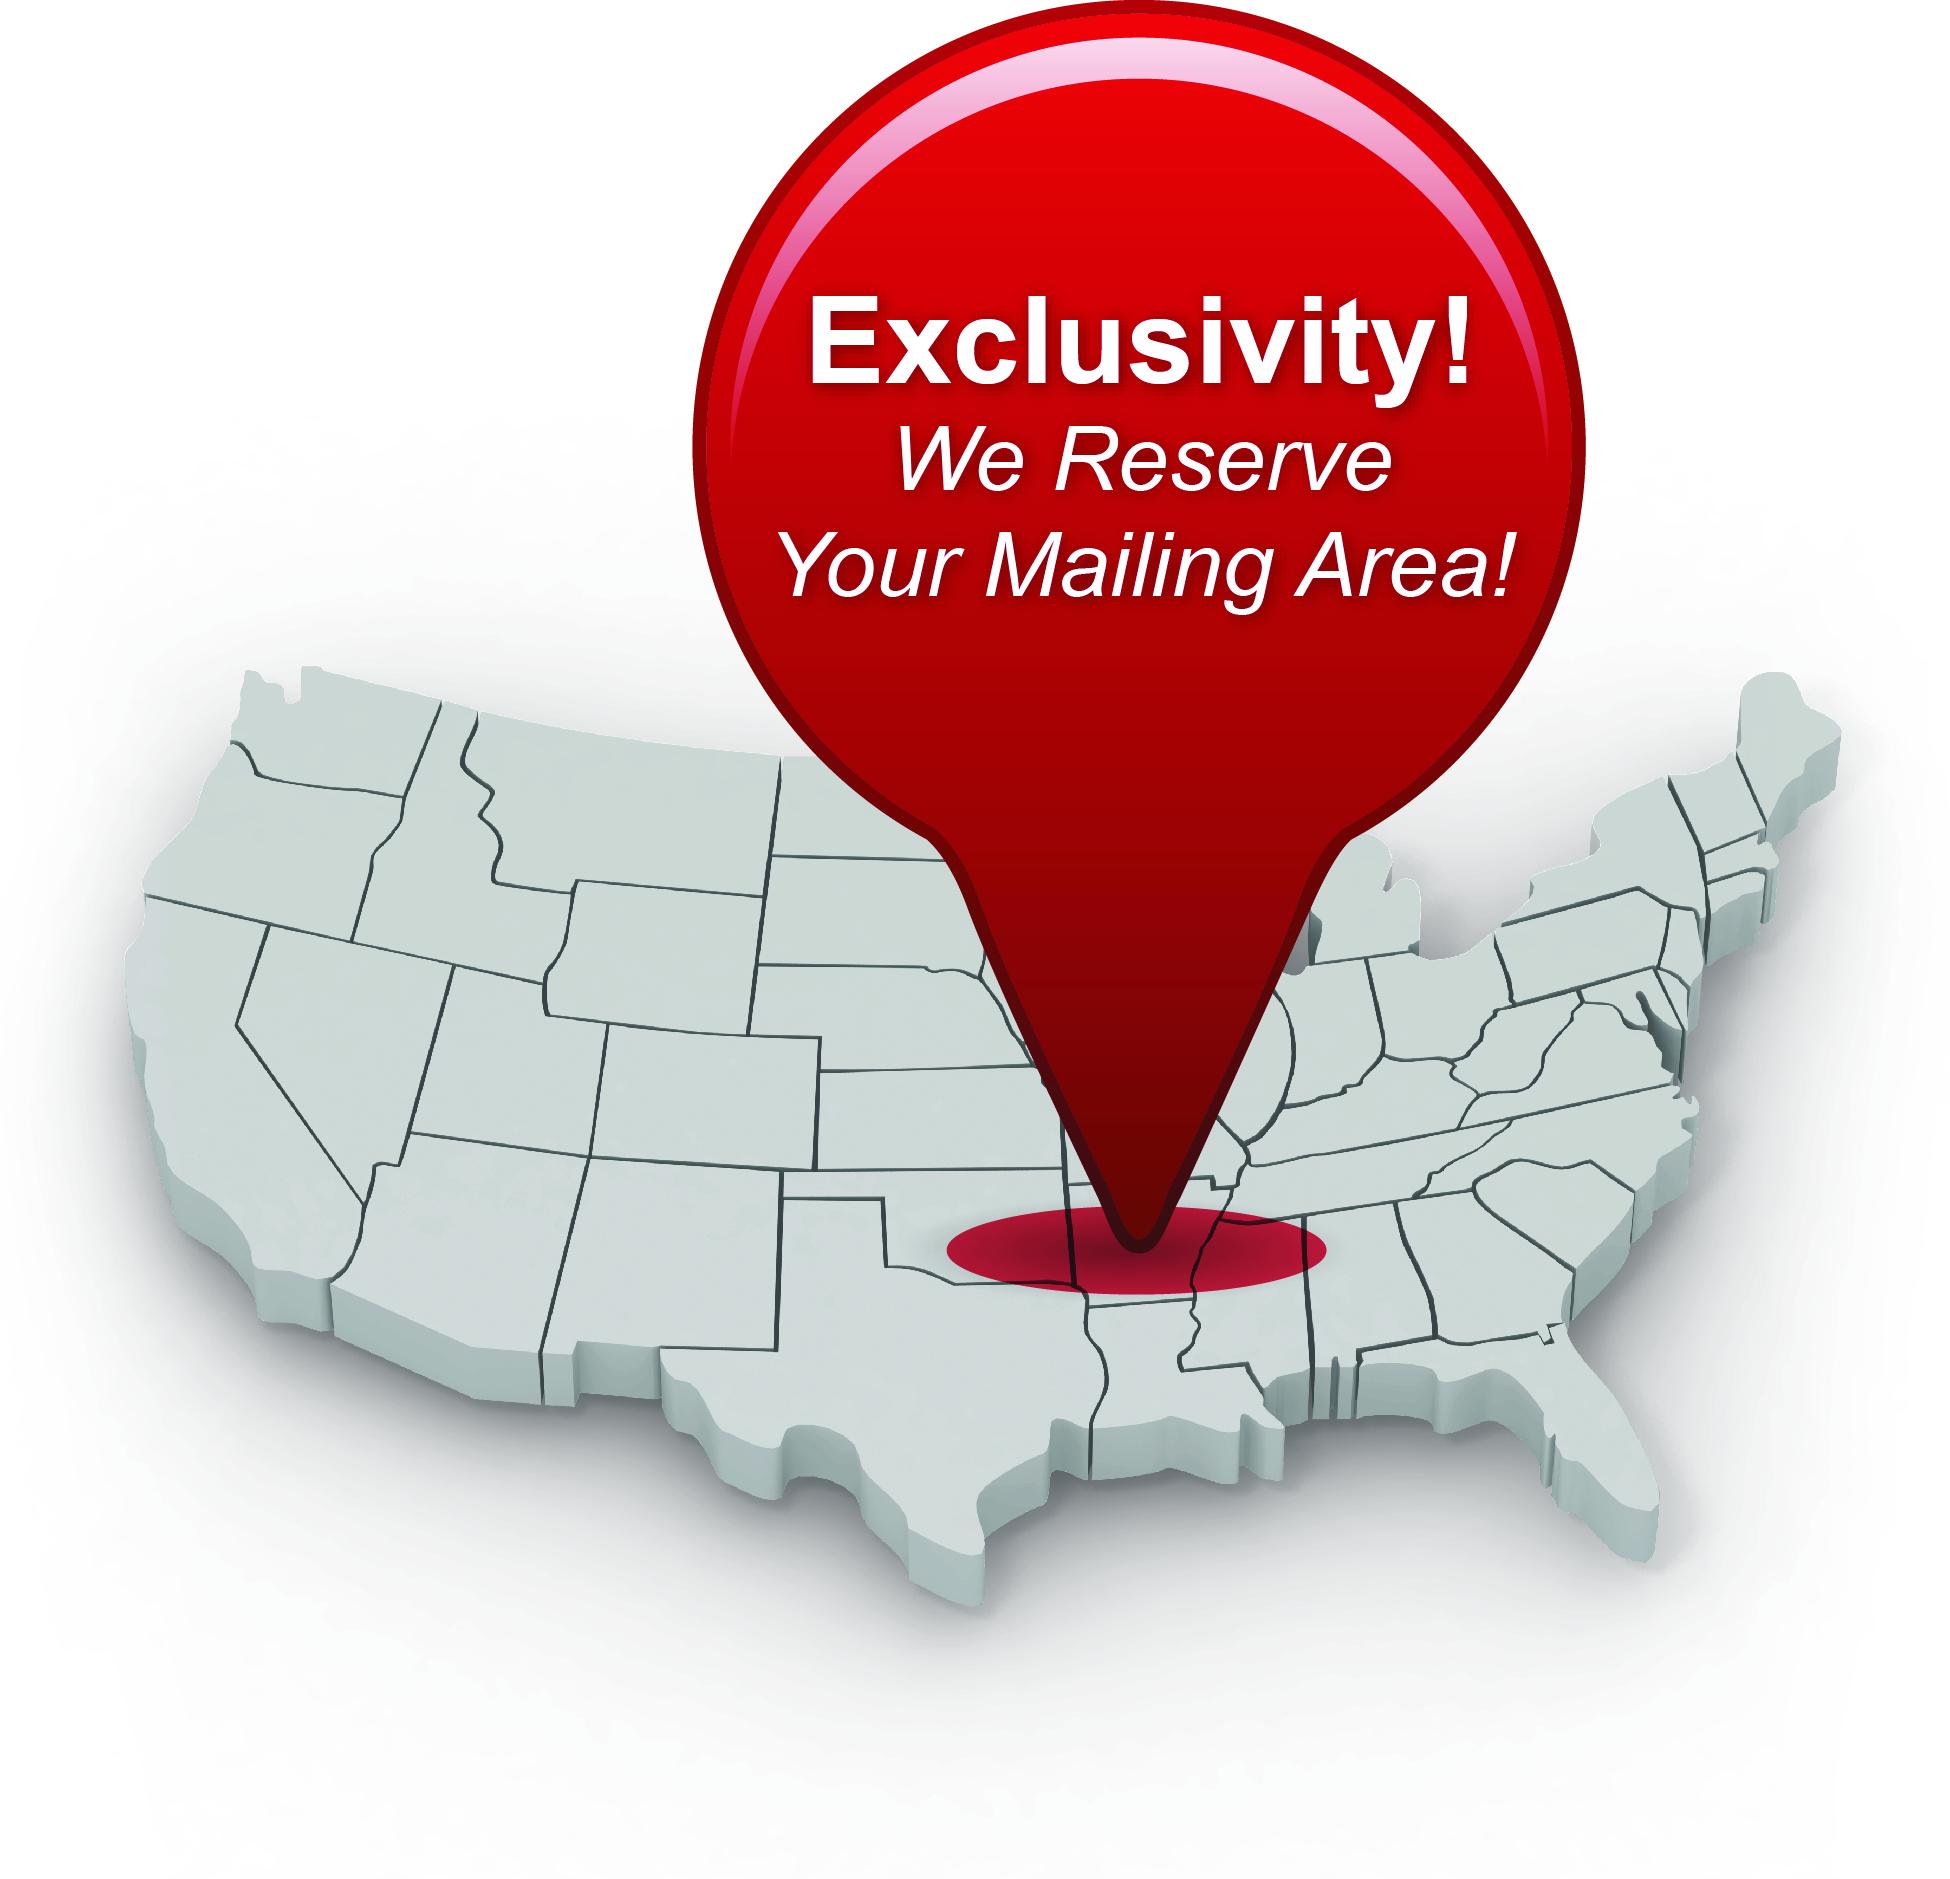 Exclusivity